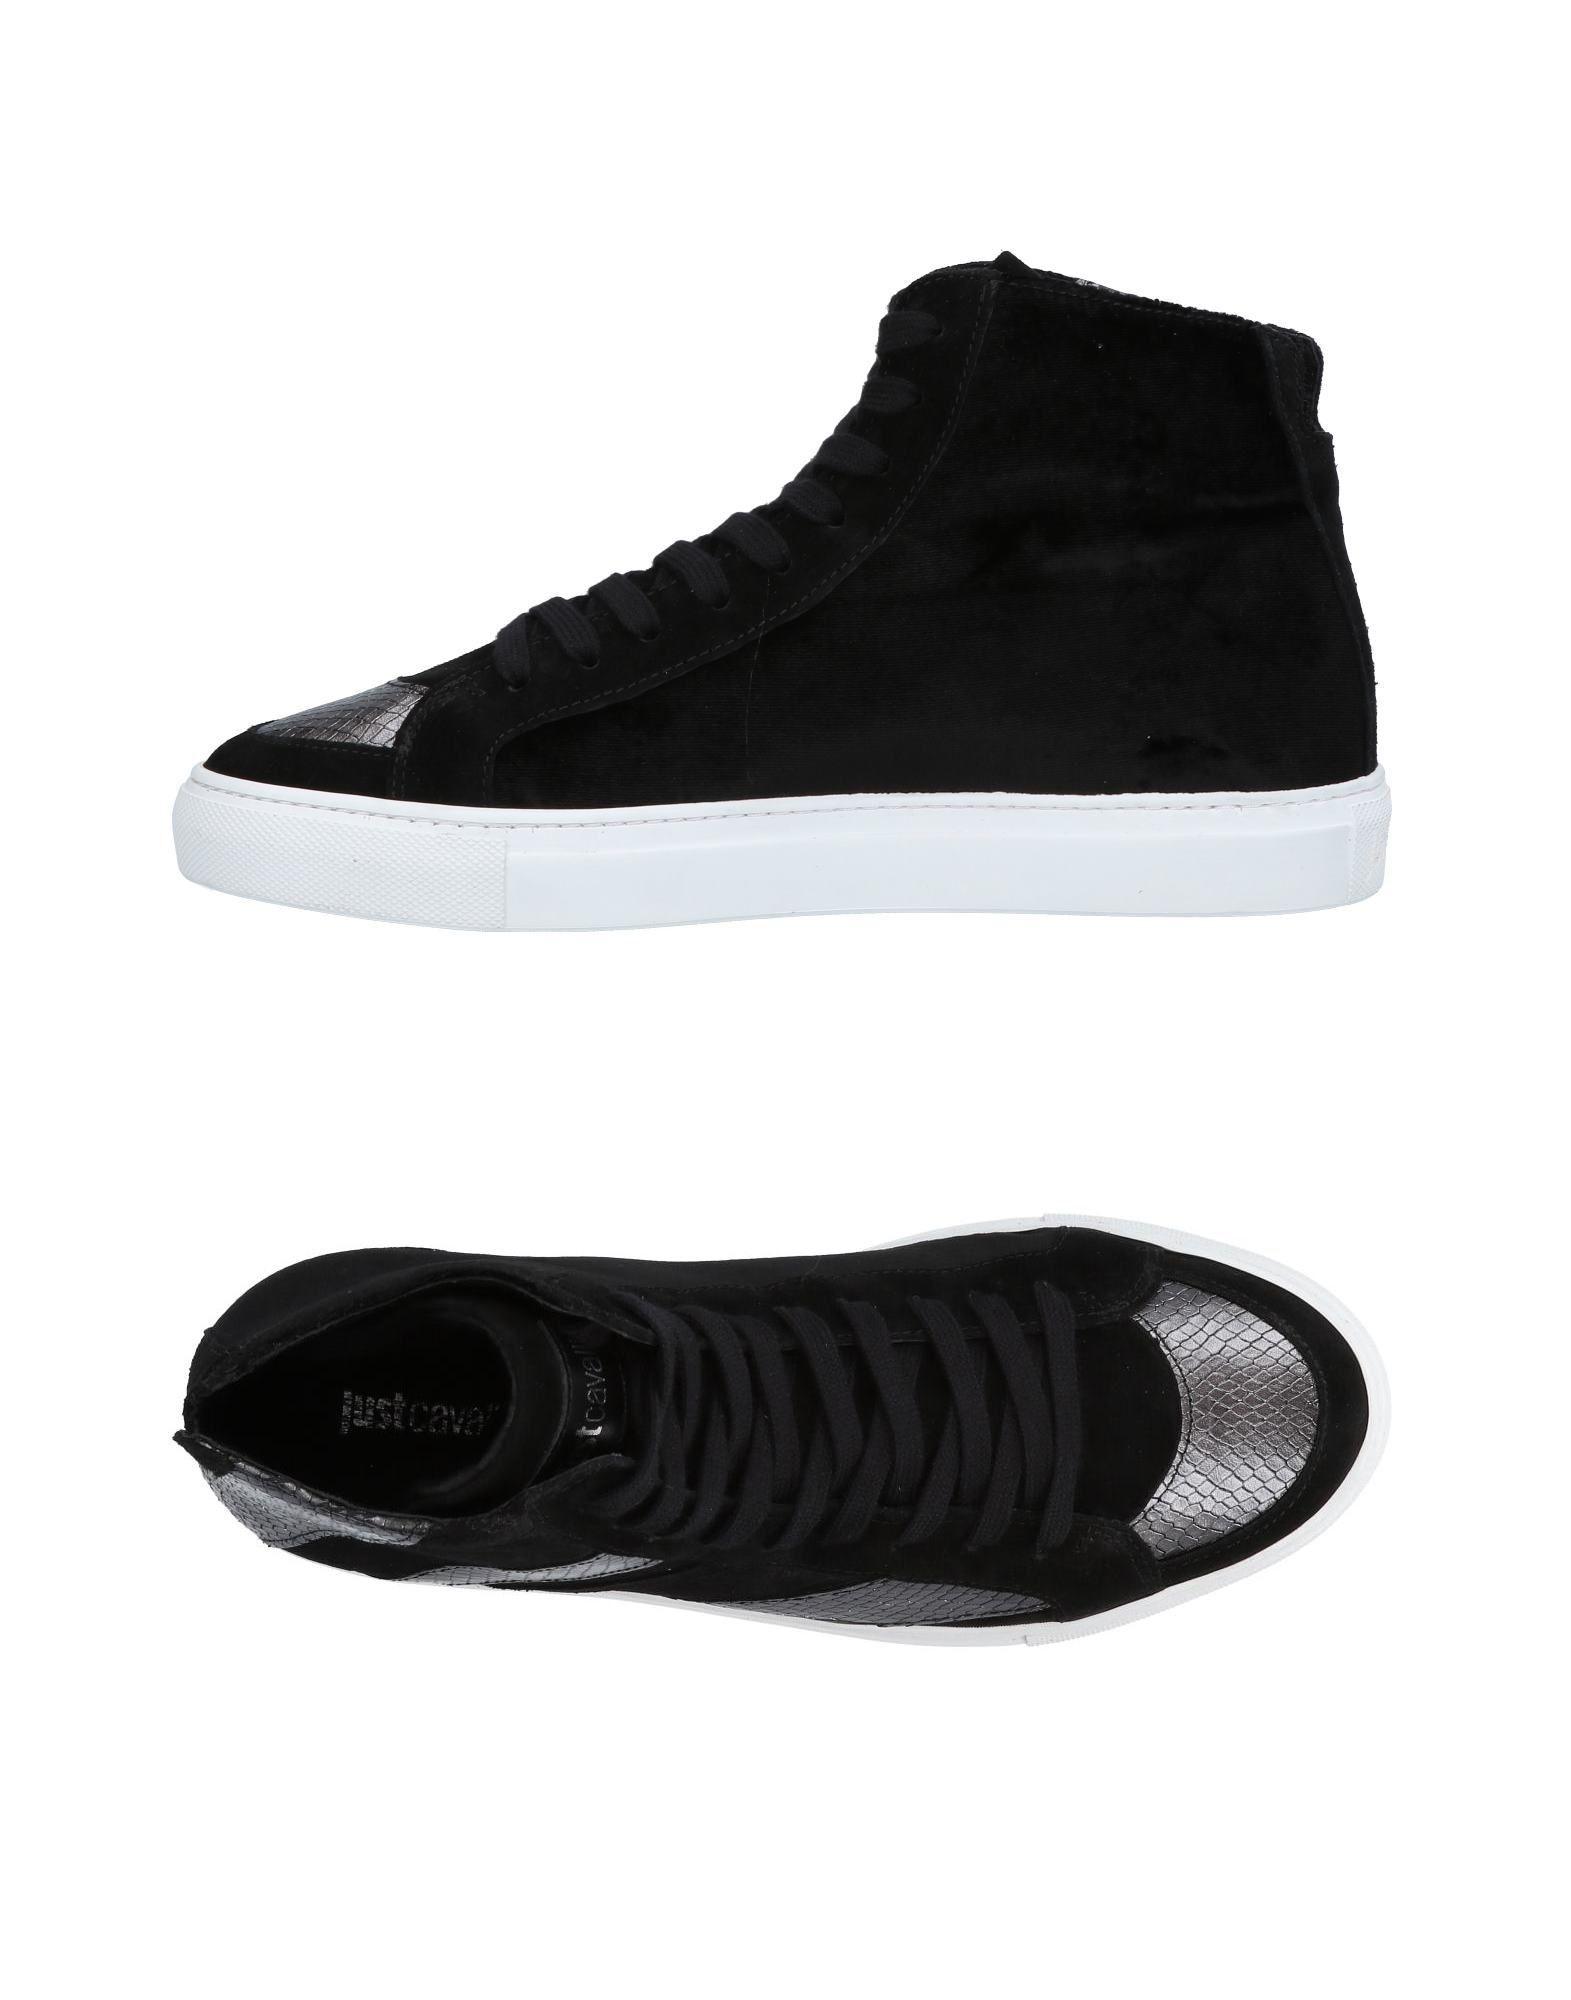 Sneakers Just Cavalli Donna - Acquista online su